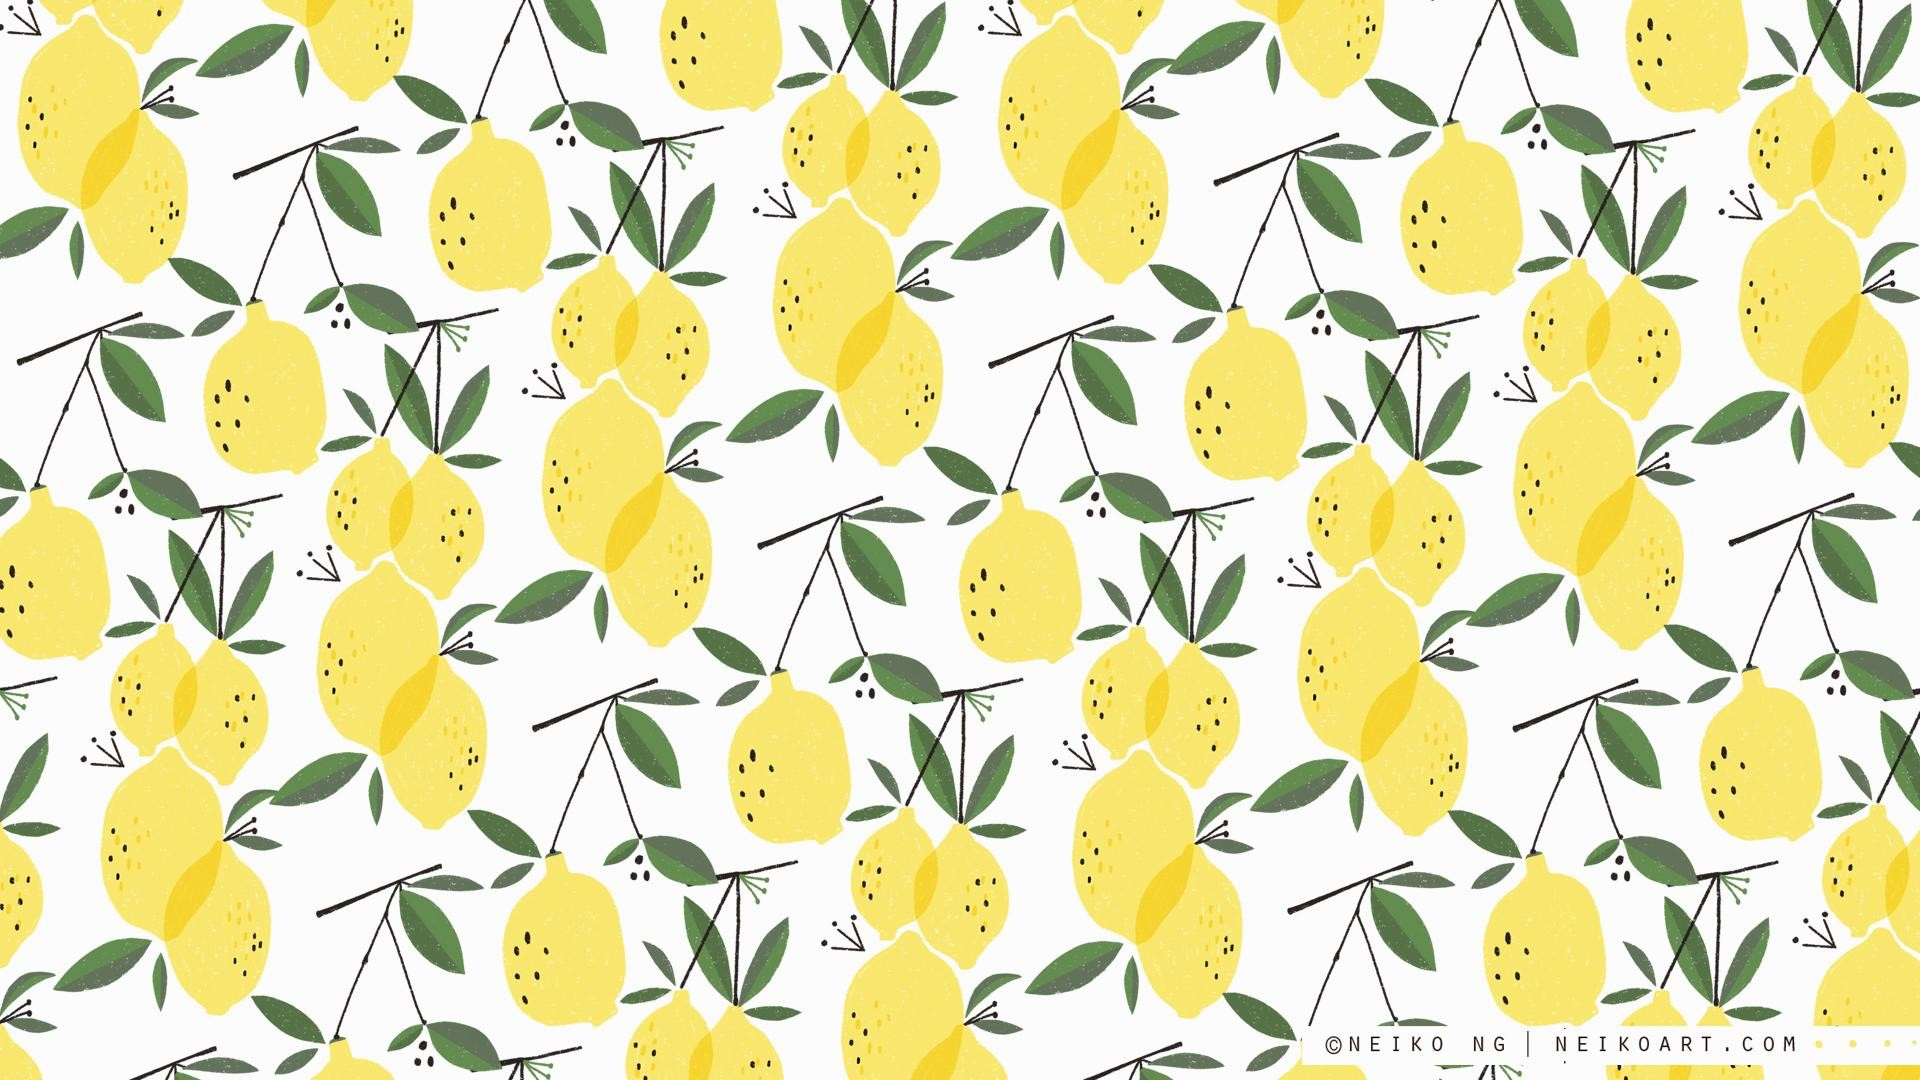 1920x1080 1920%C3%971080-wallpaper